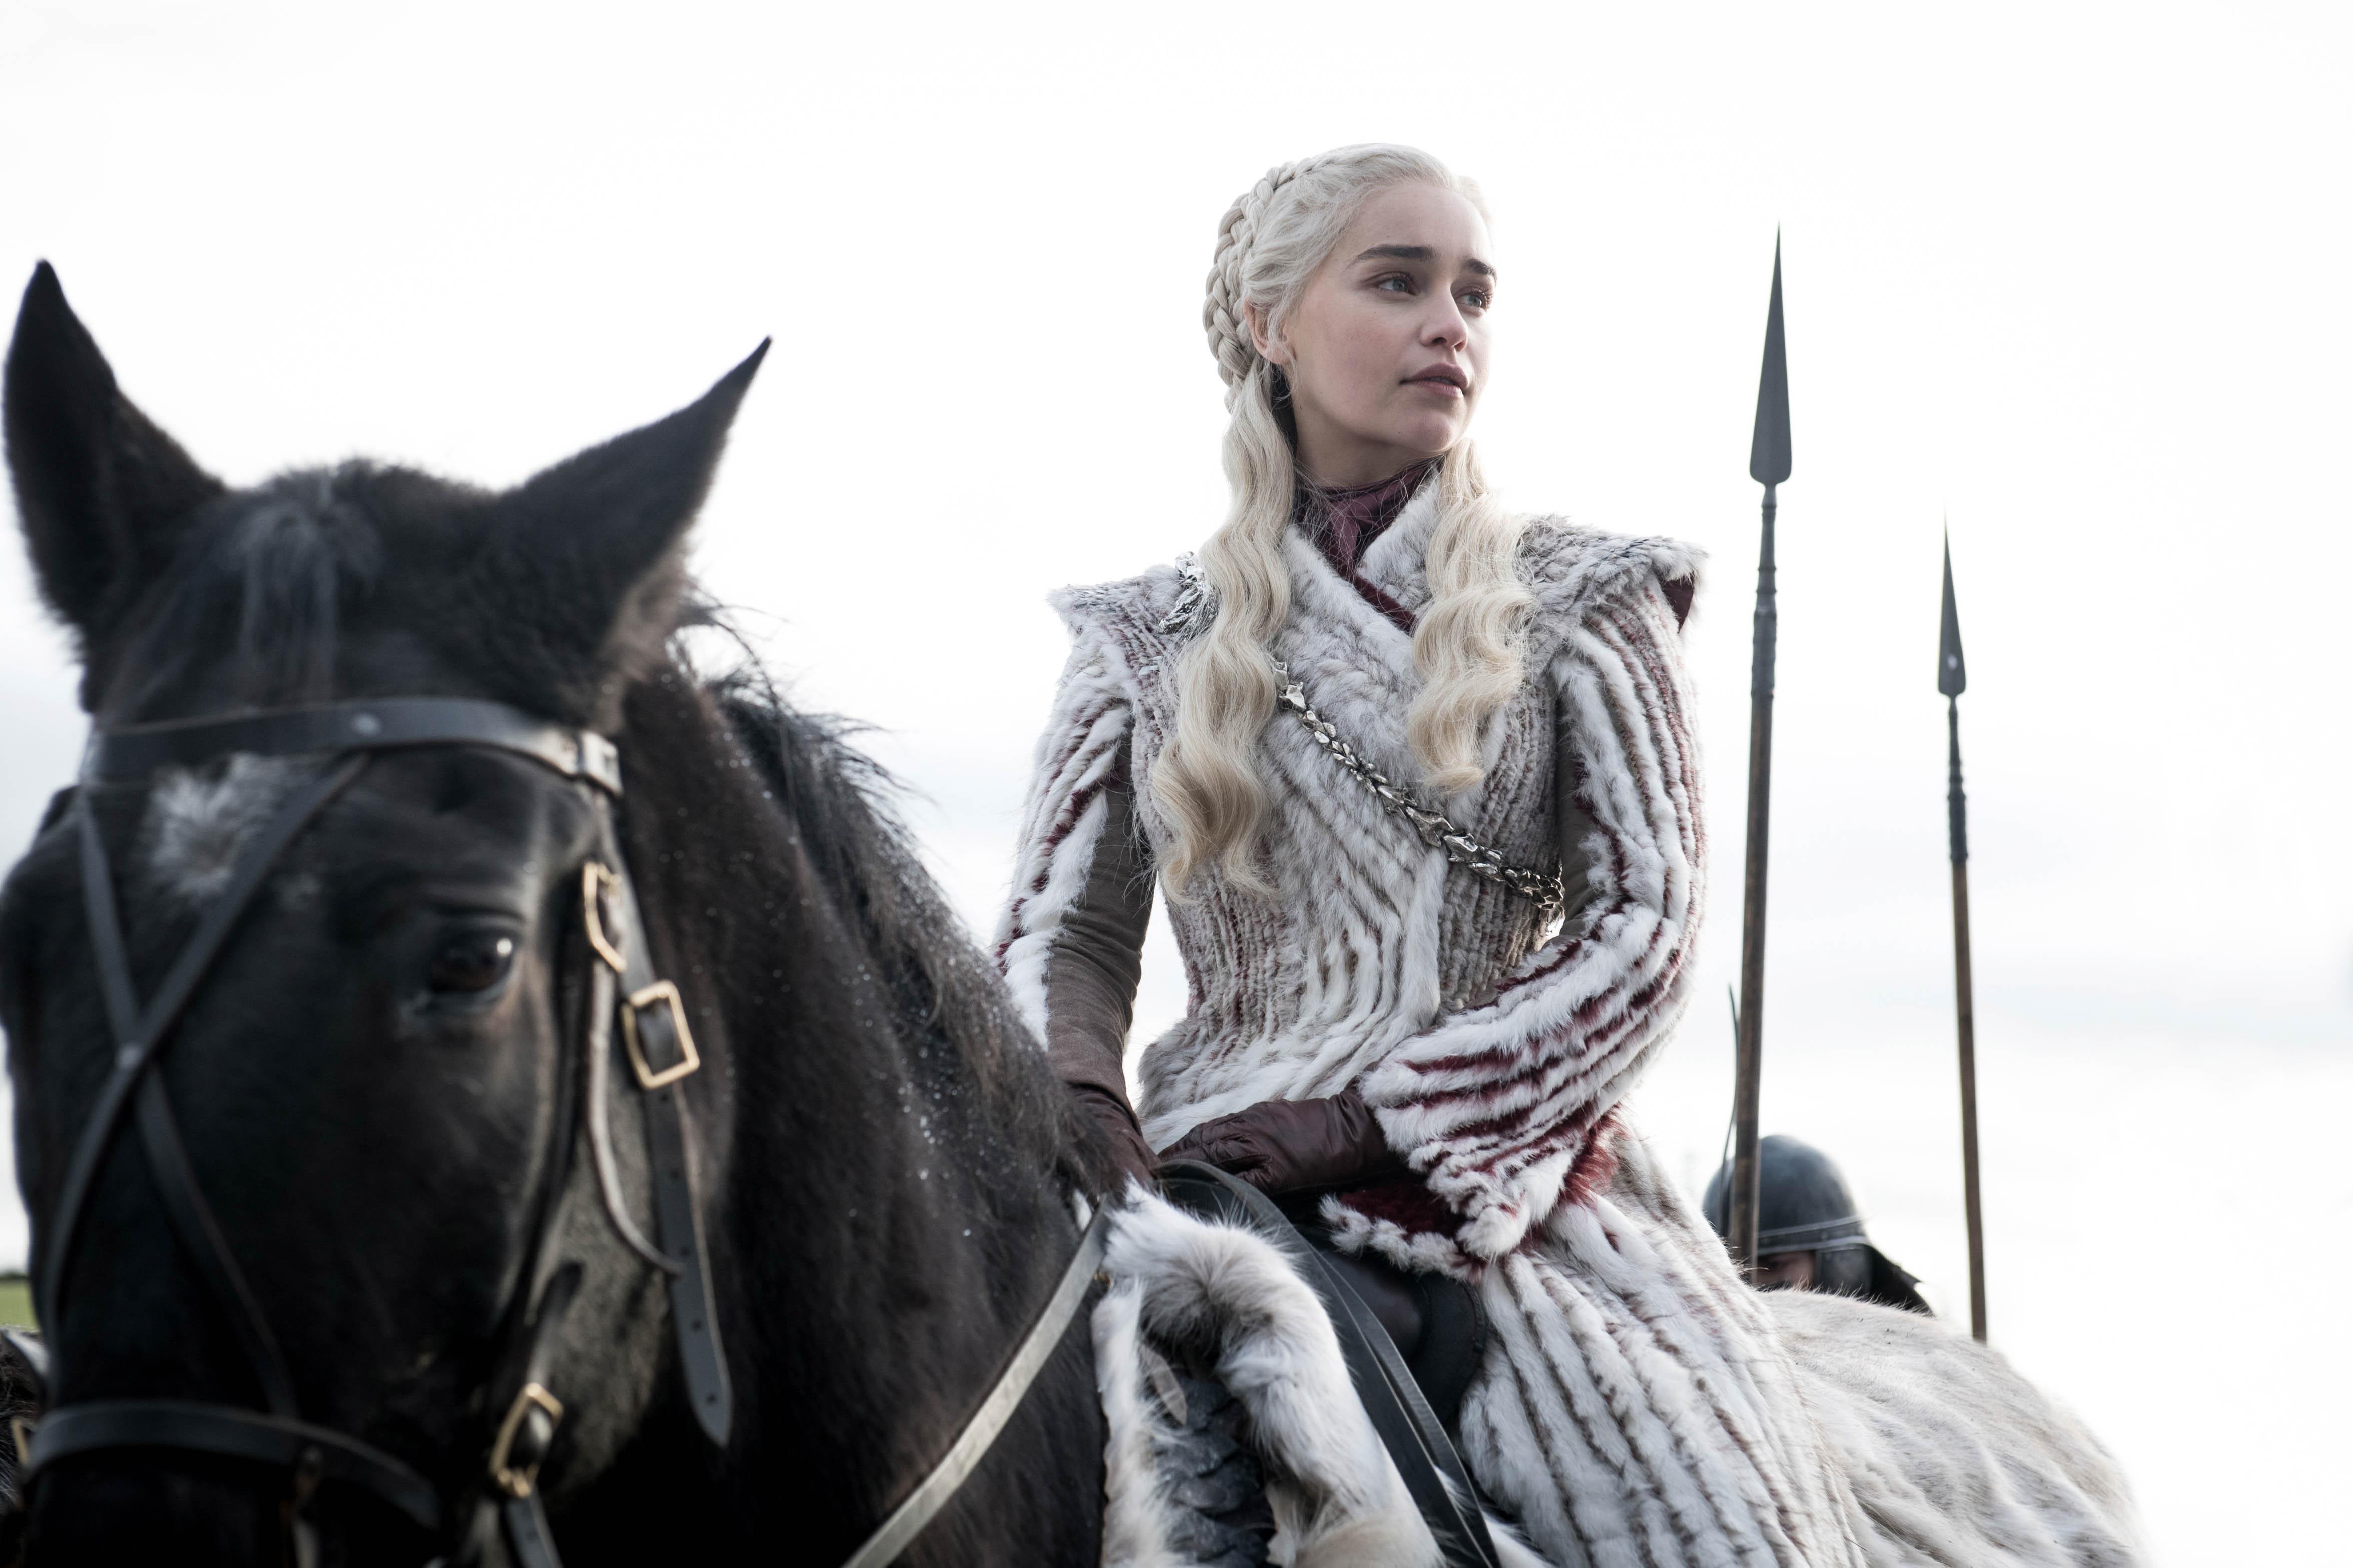 daenerys-targaryen-white-fur-coat-game-of-thrones